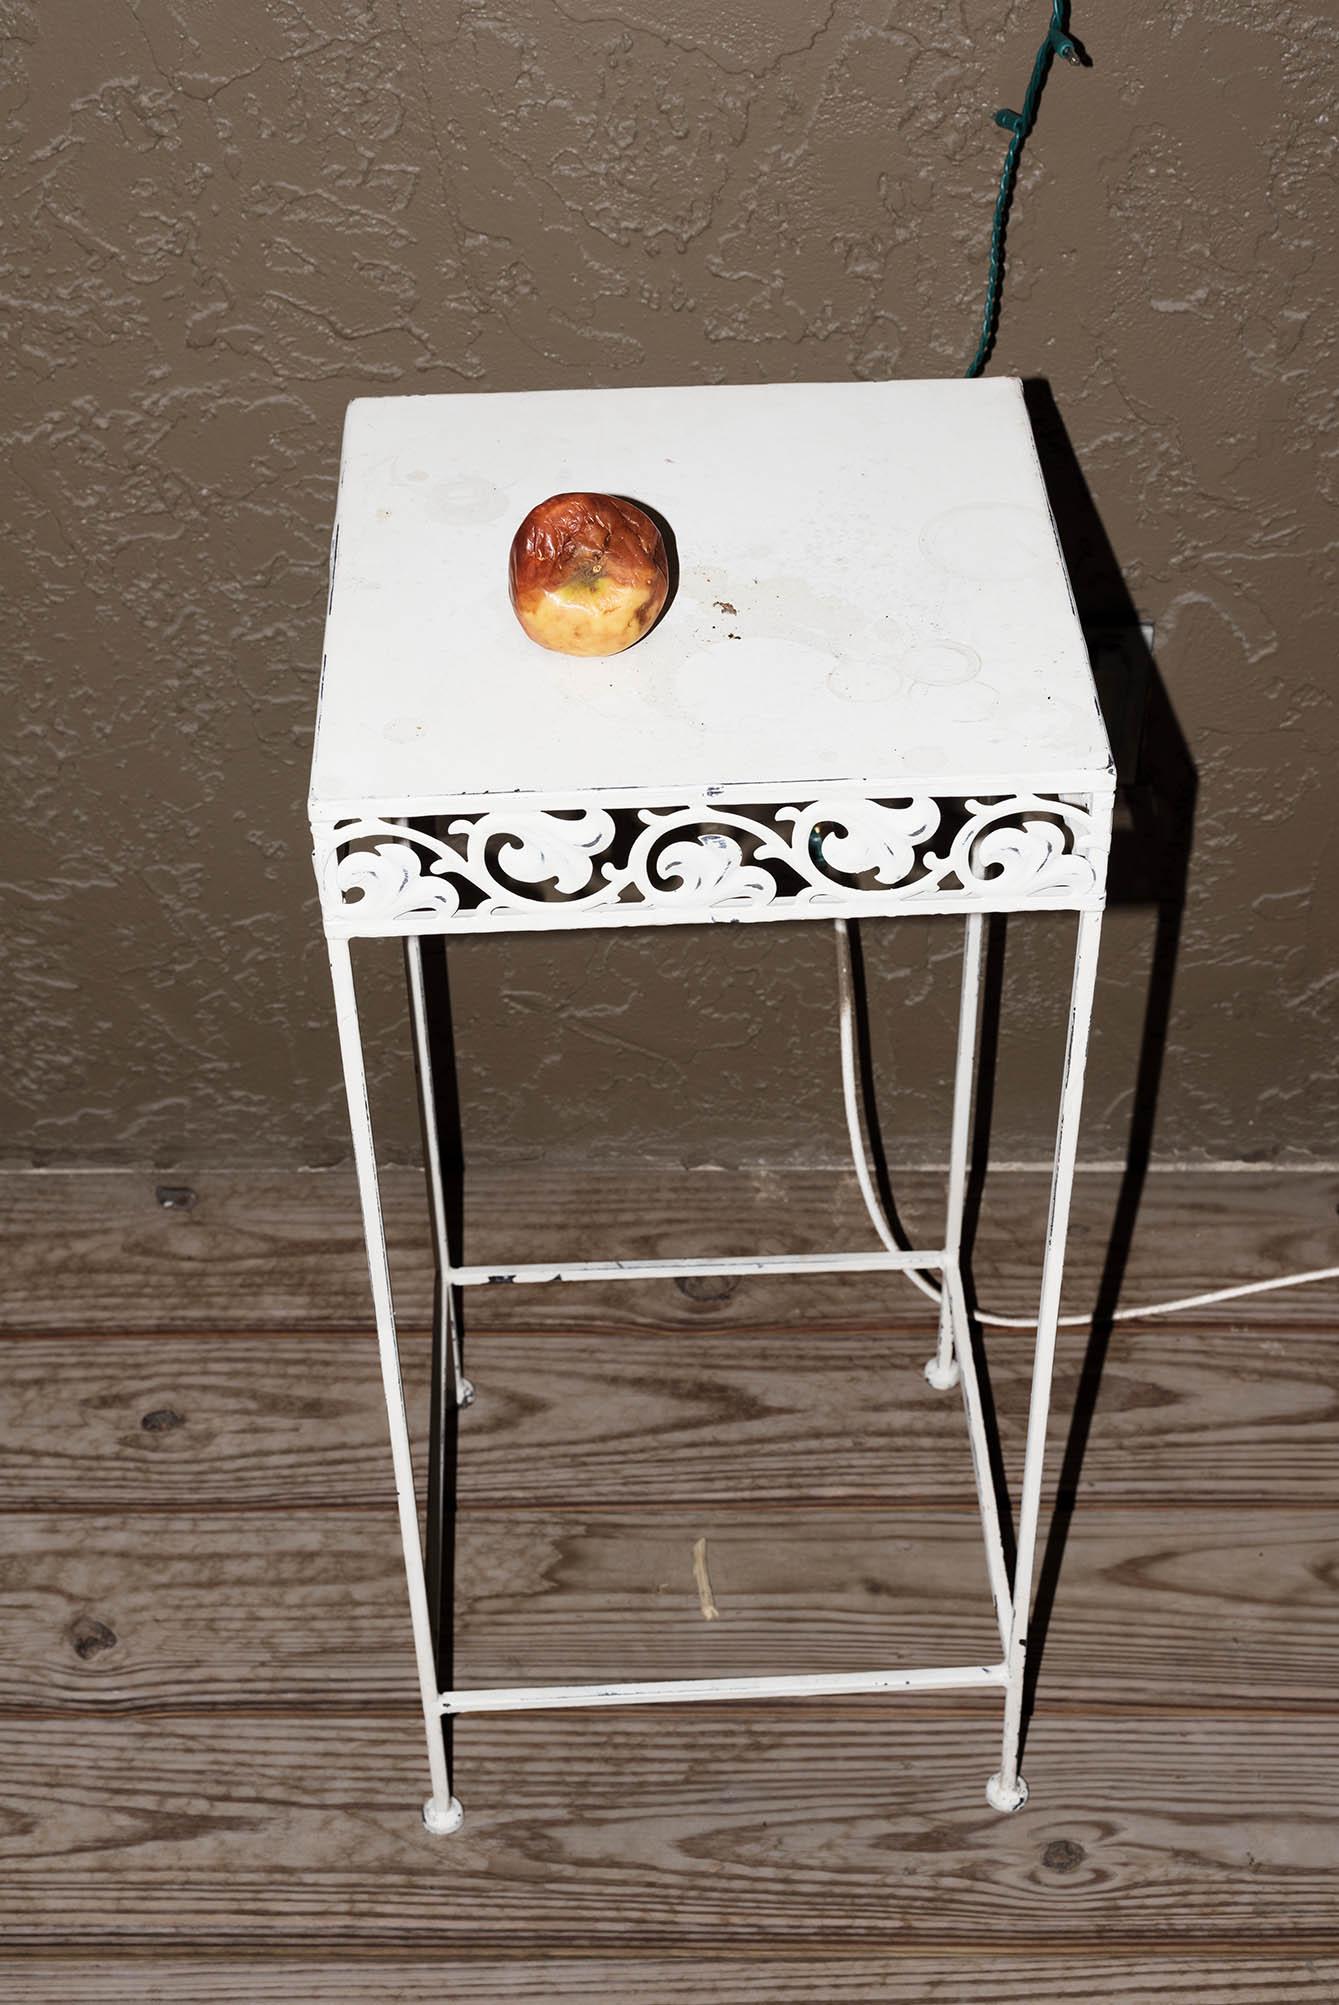 rotten_apple_on_table_outside.jpg